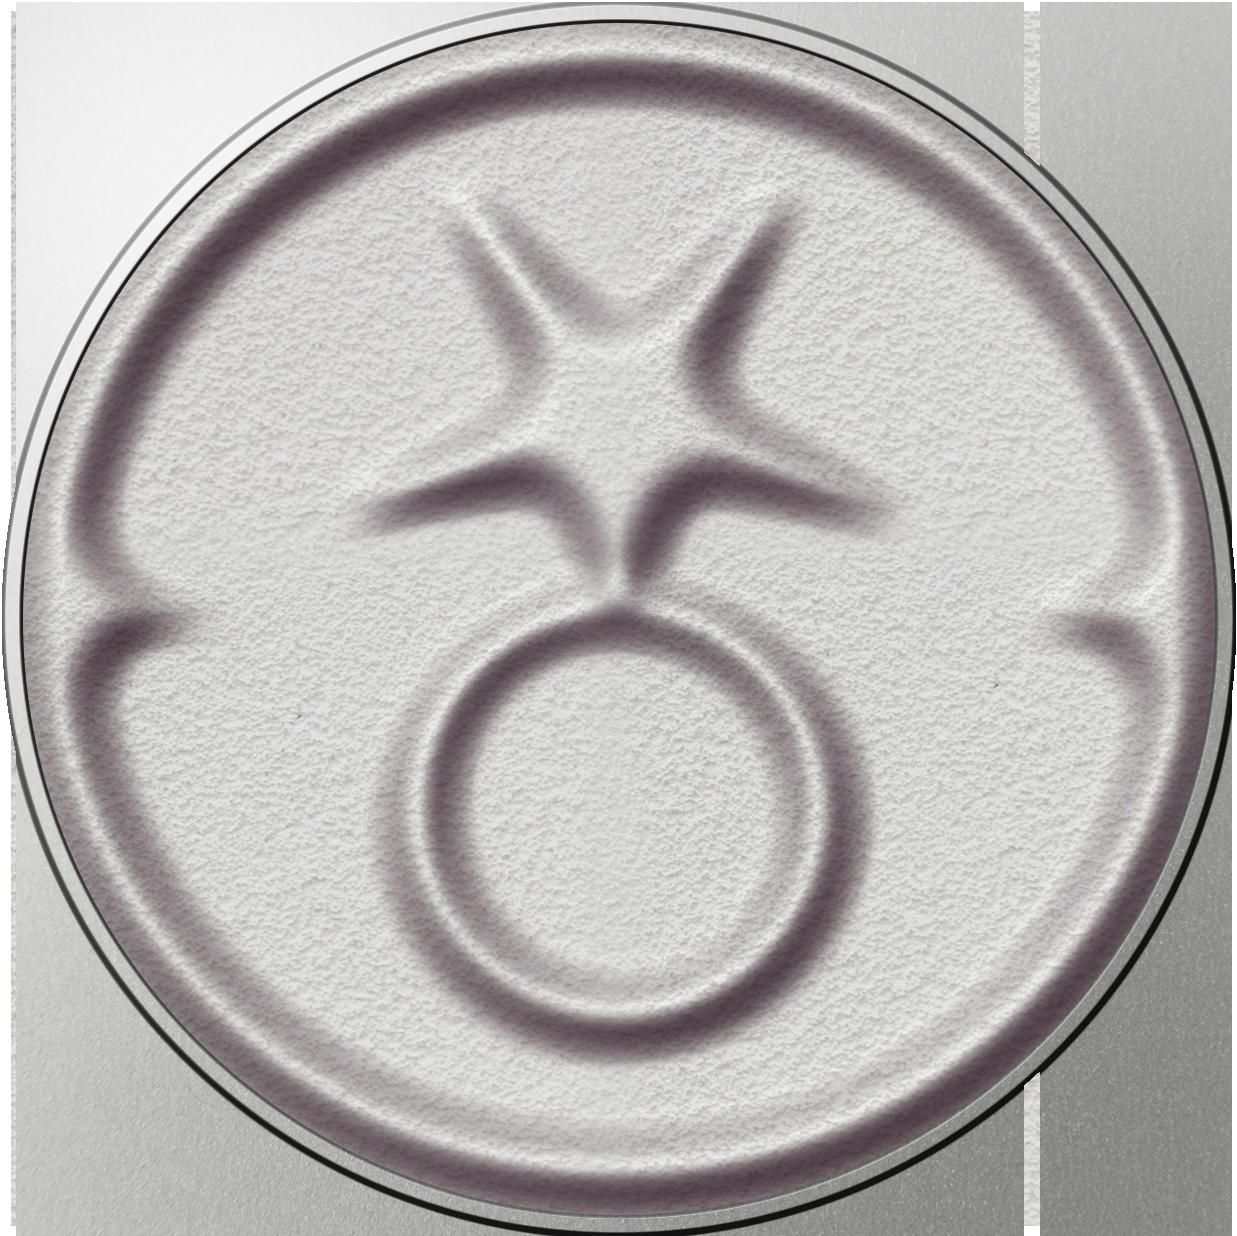 07-Spiritual-Ones.png